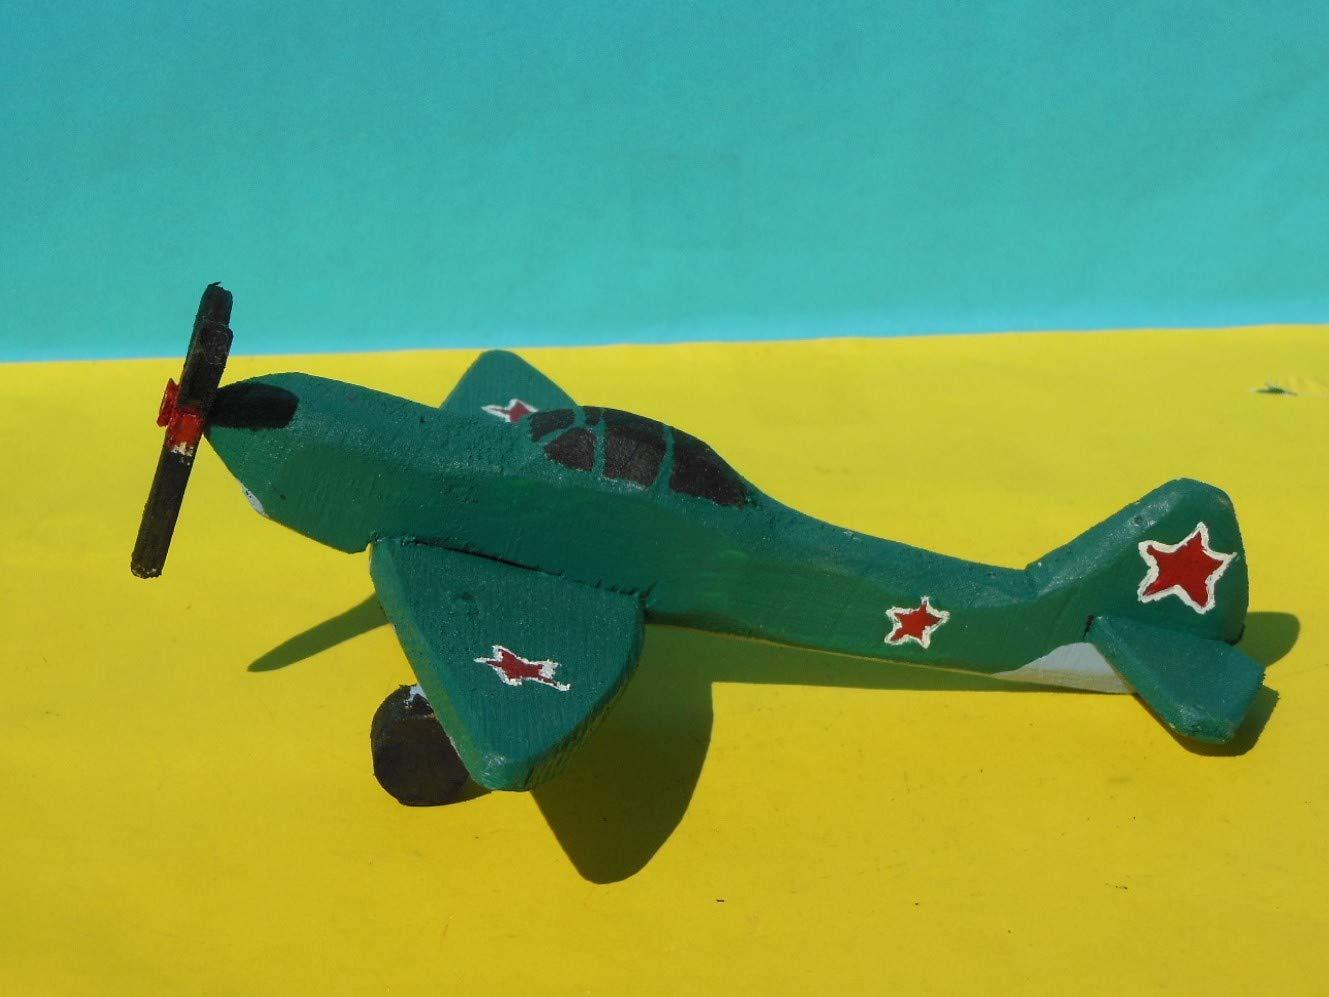 Wooden Toy Yakolev Yak1 Airplane